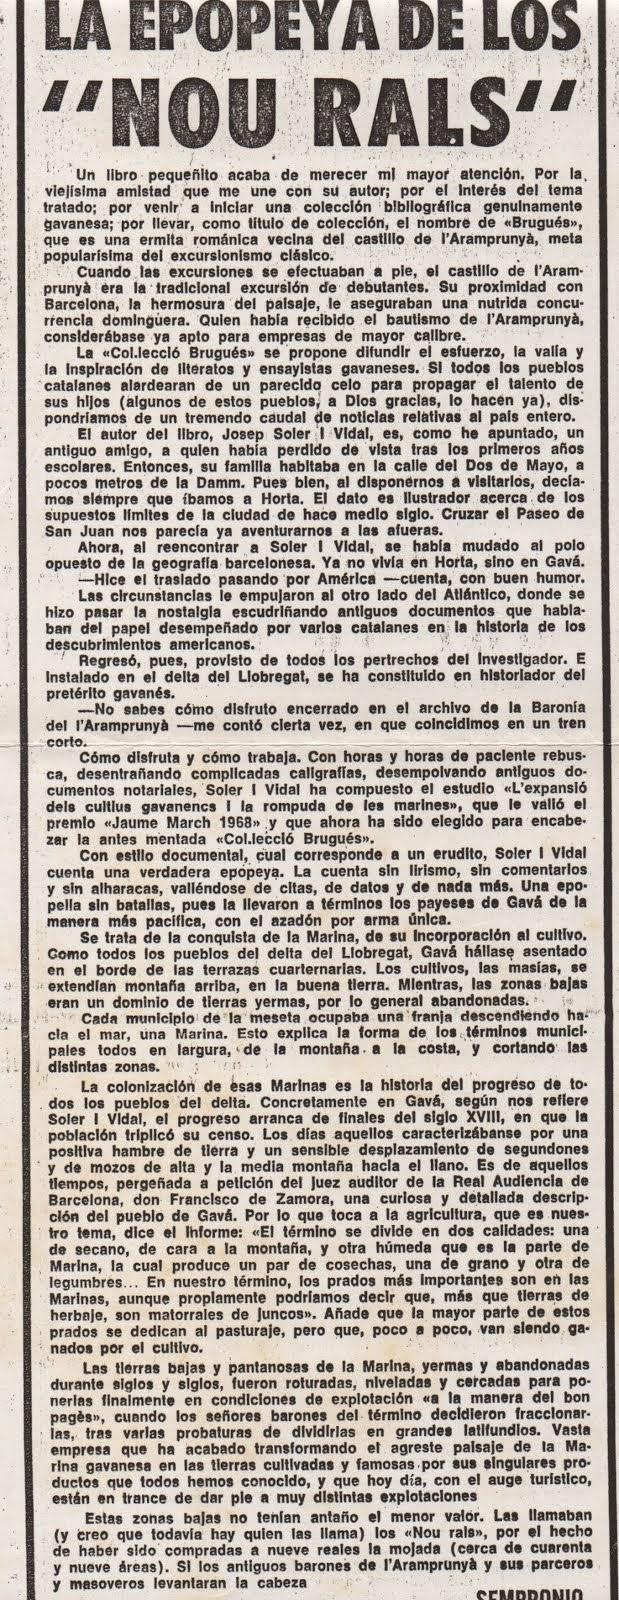 Diari Tele/Expres, 1969